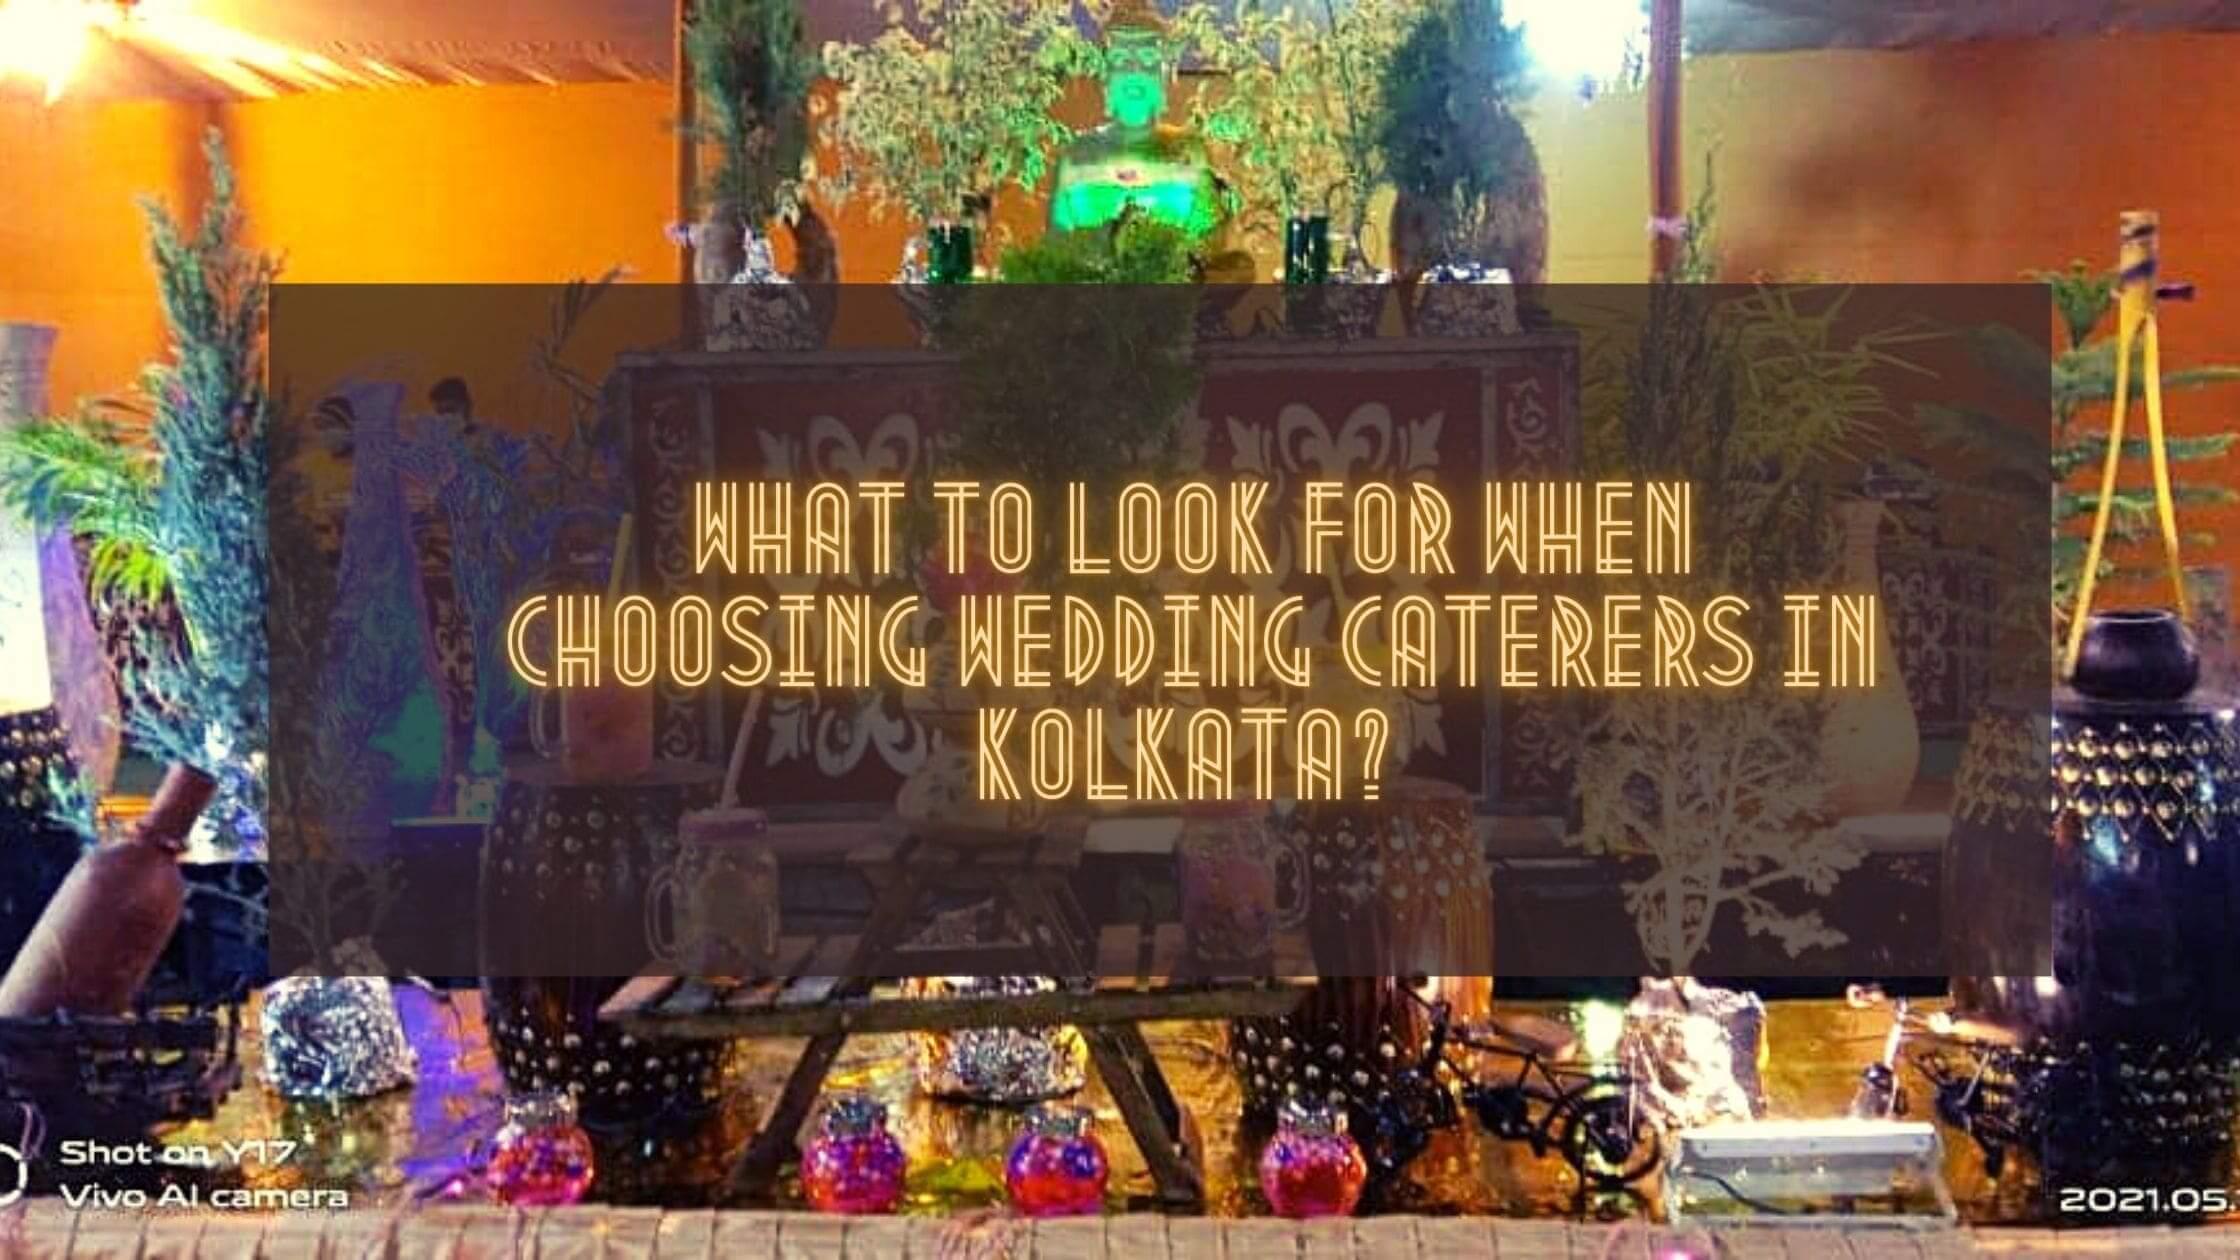 Wedding Caterers in Kolkata